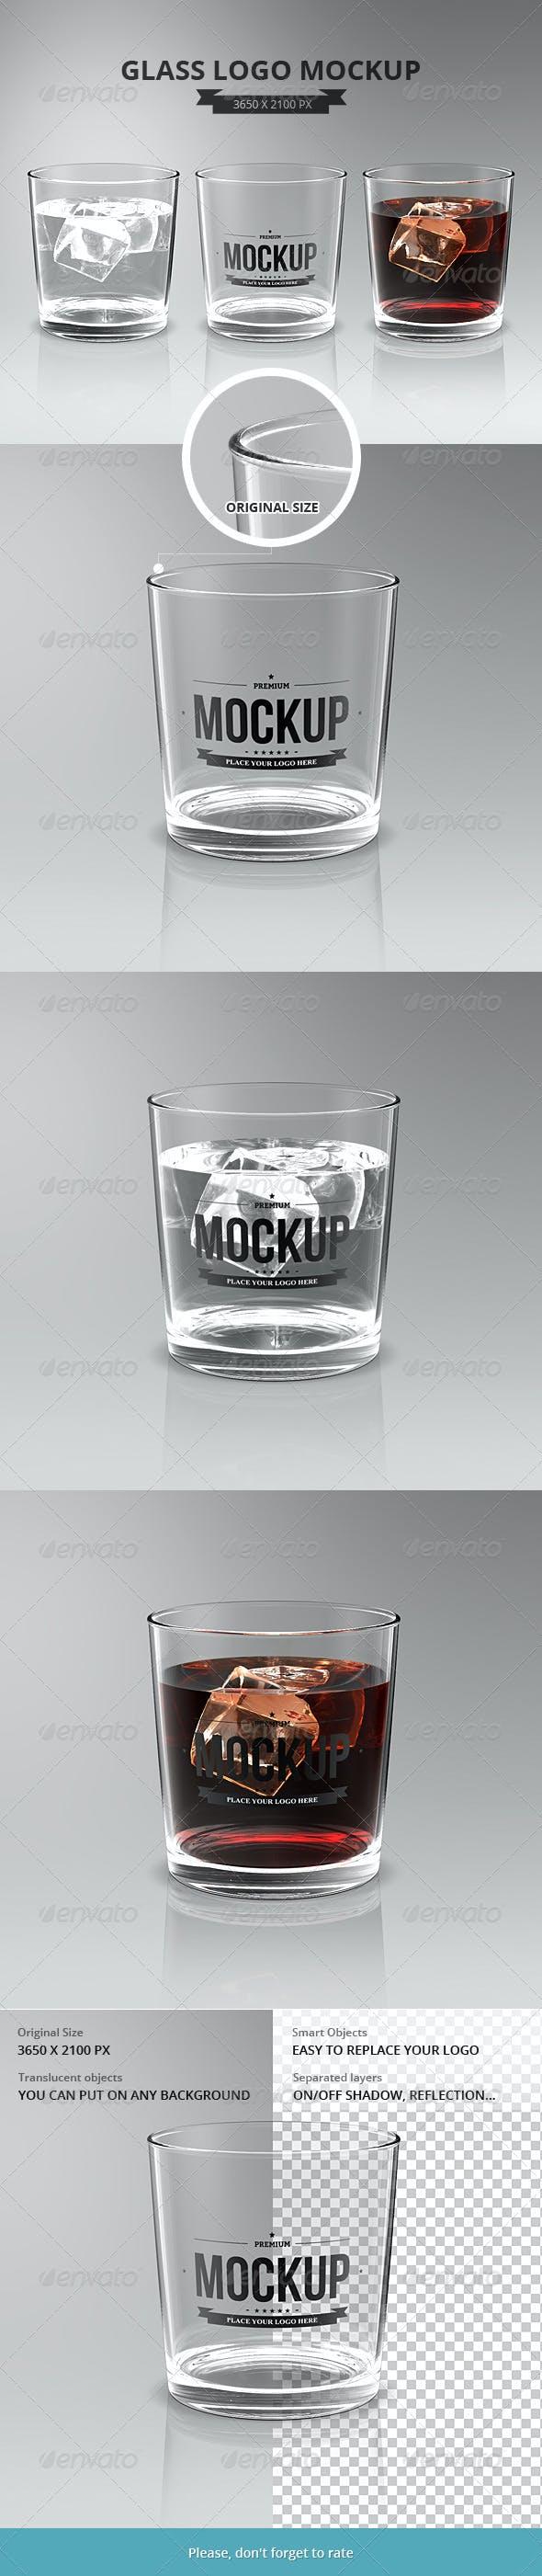 Glasses Logo Mockup